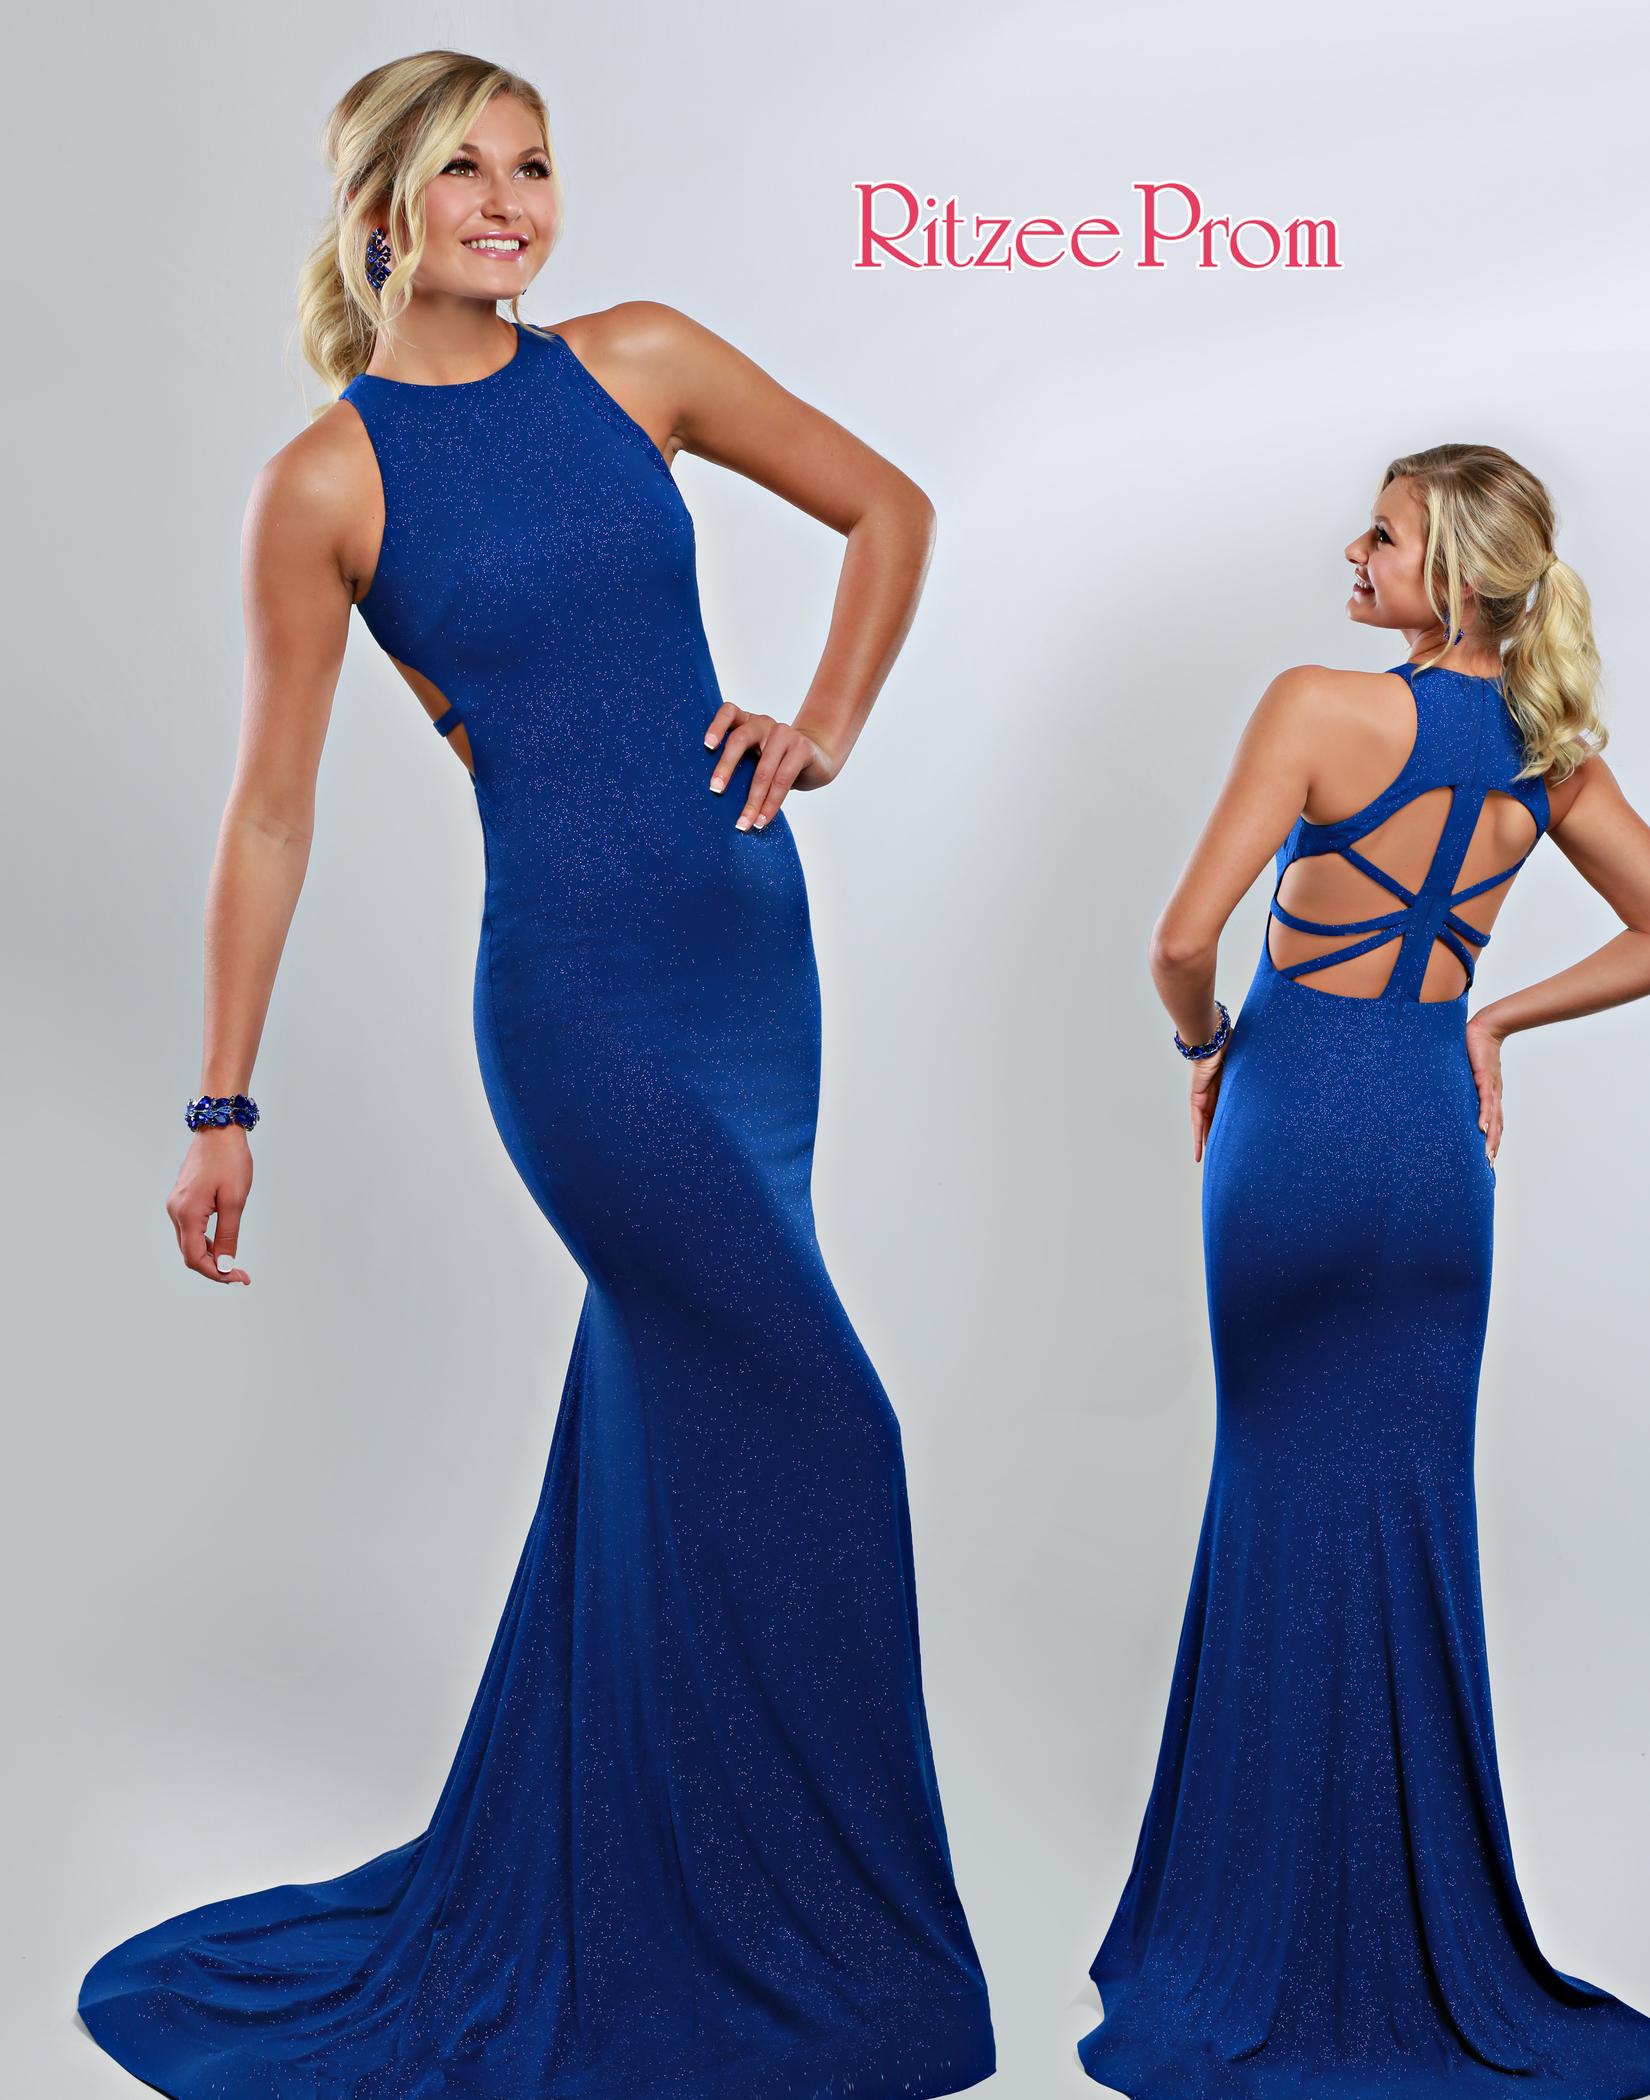 6b75a952b3 Red Ritzee Girl Dress Coupons   Deals - dhgate.com